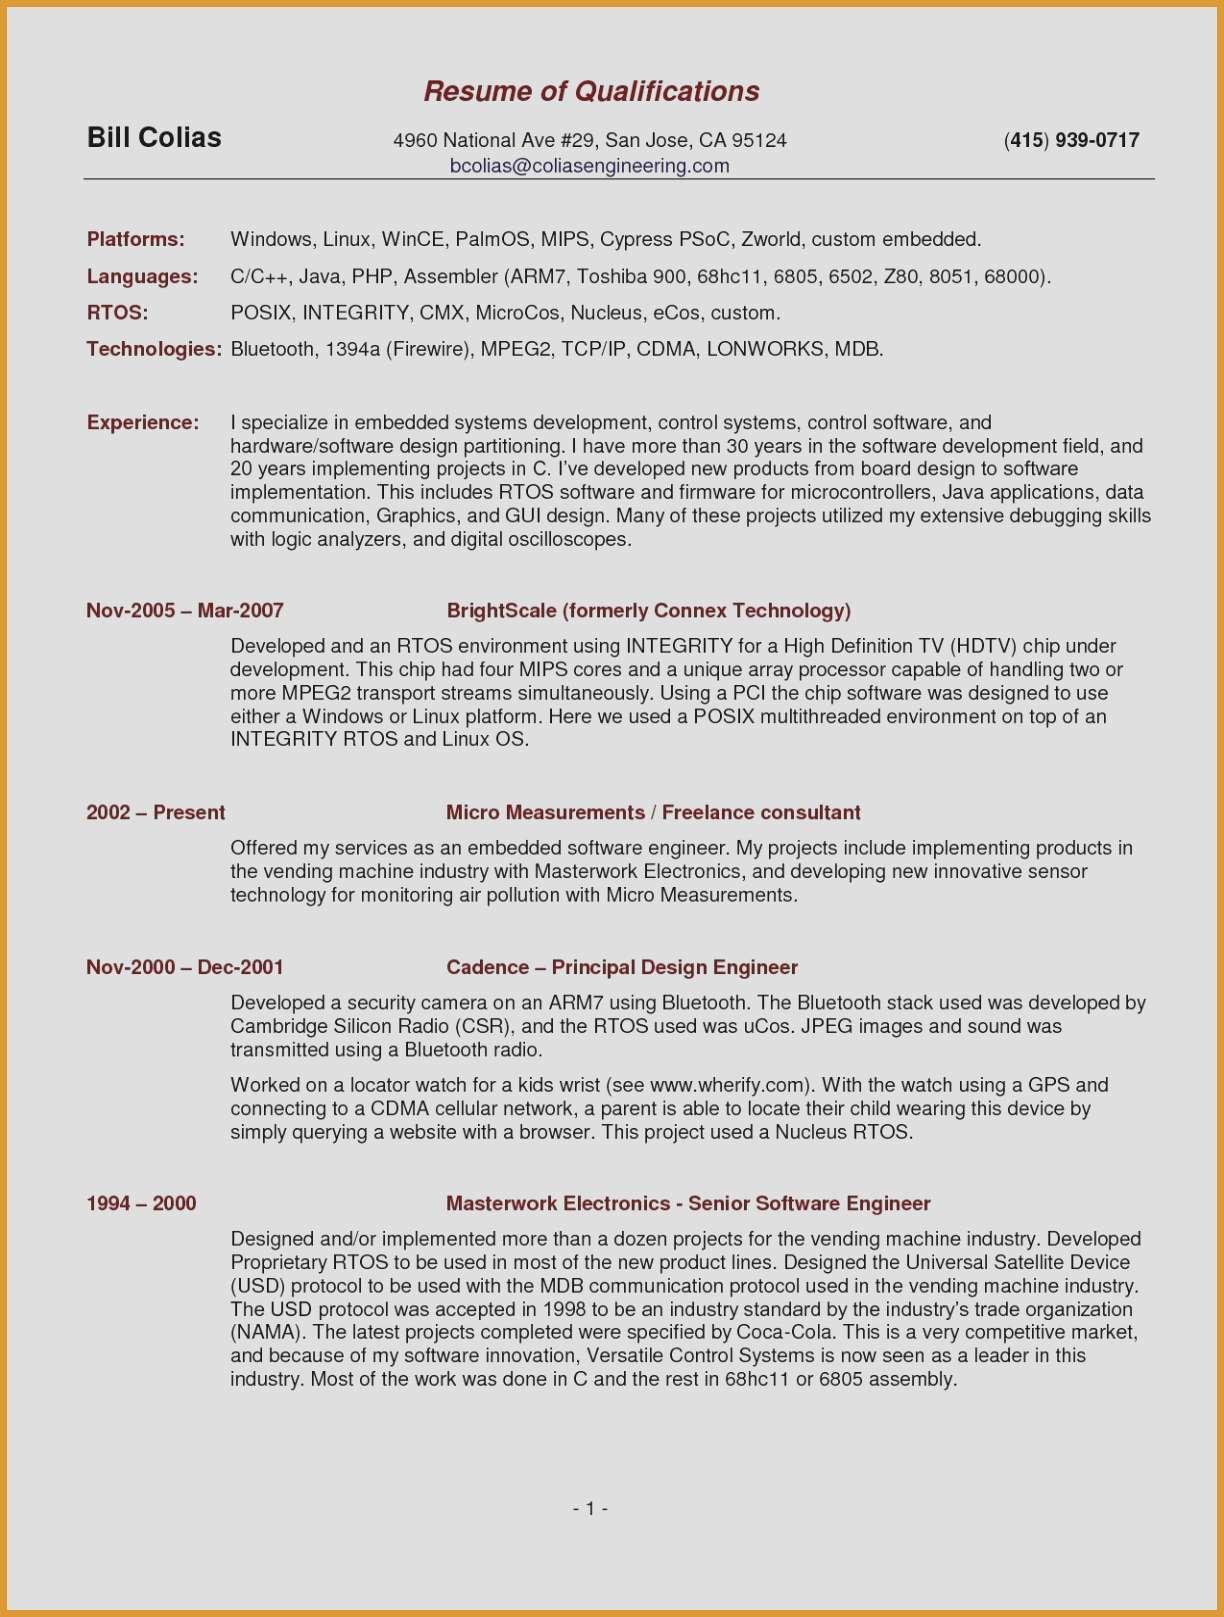 Pr Cover Letter Template - Cover Letter for Resume Template Best Pr Resume Template Elegant